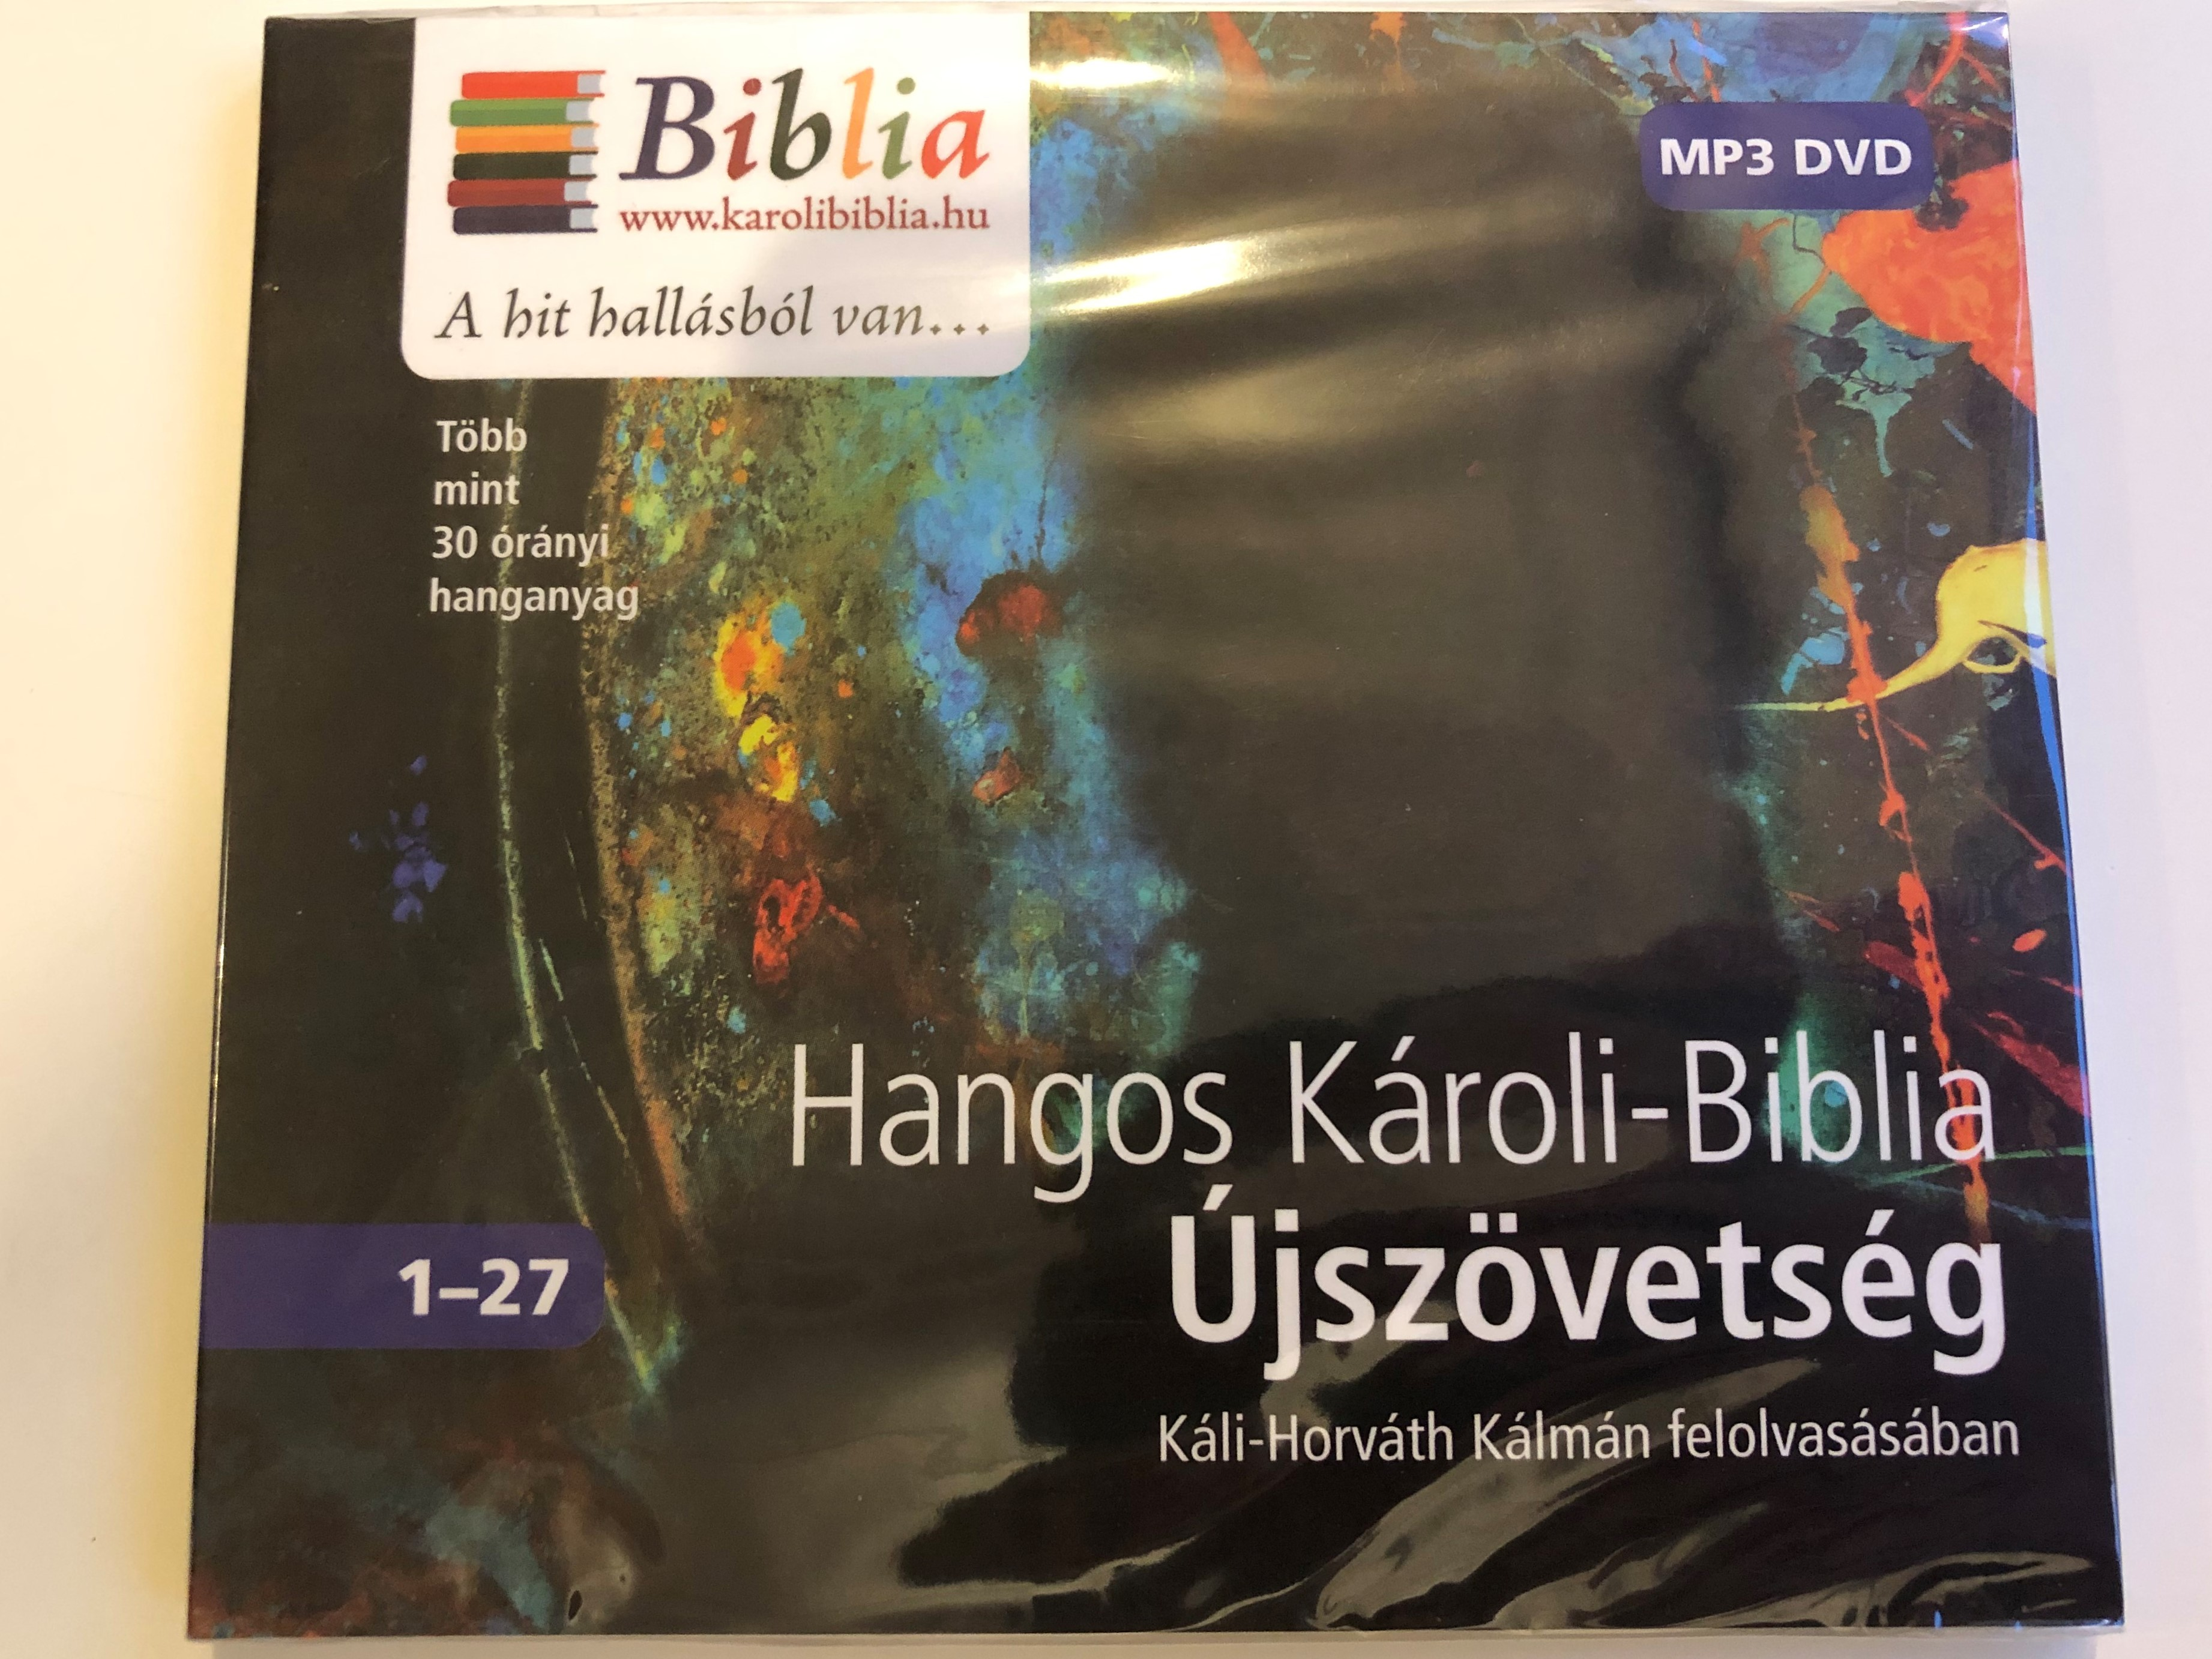 hangos-k-roli-biblia-jsz-vets-g-k-li-horv-th-k-lm-n-felolvas-s-ban-1.jpg